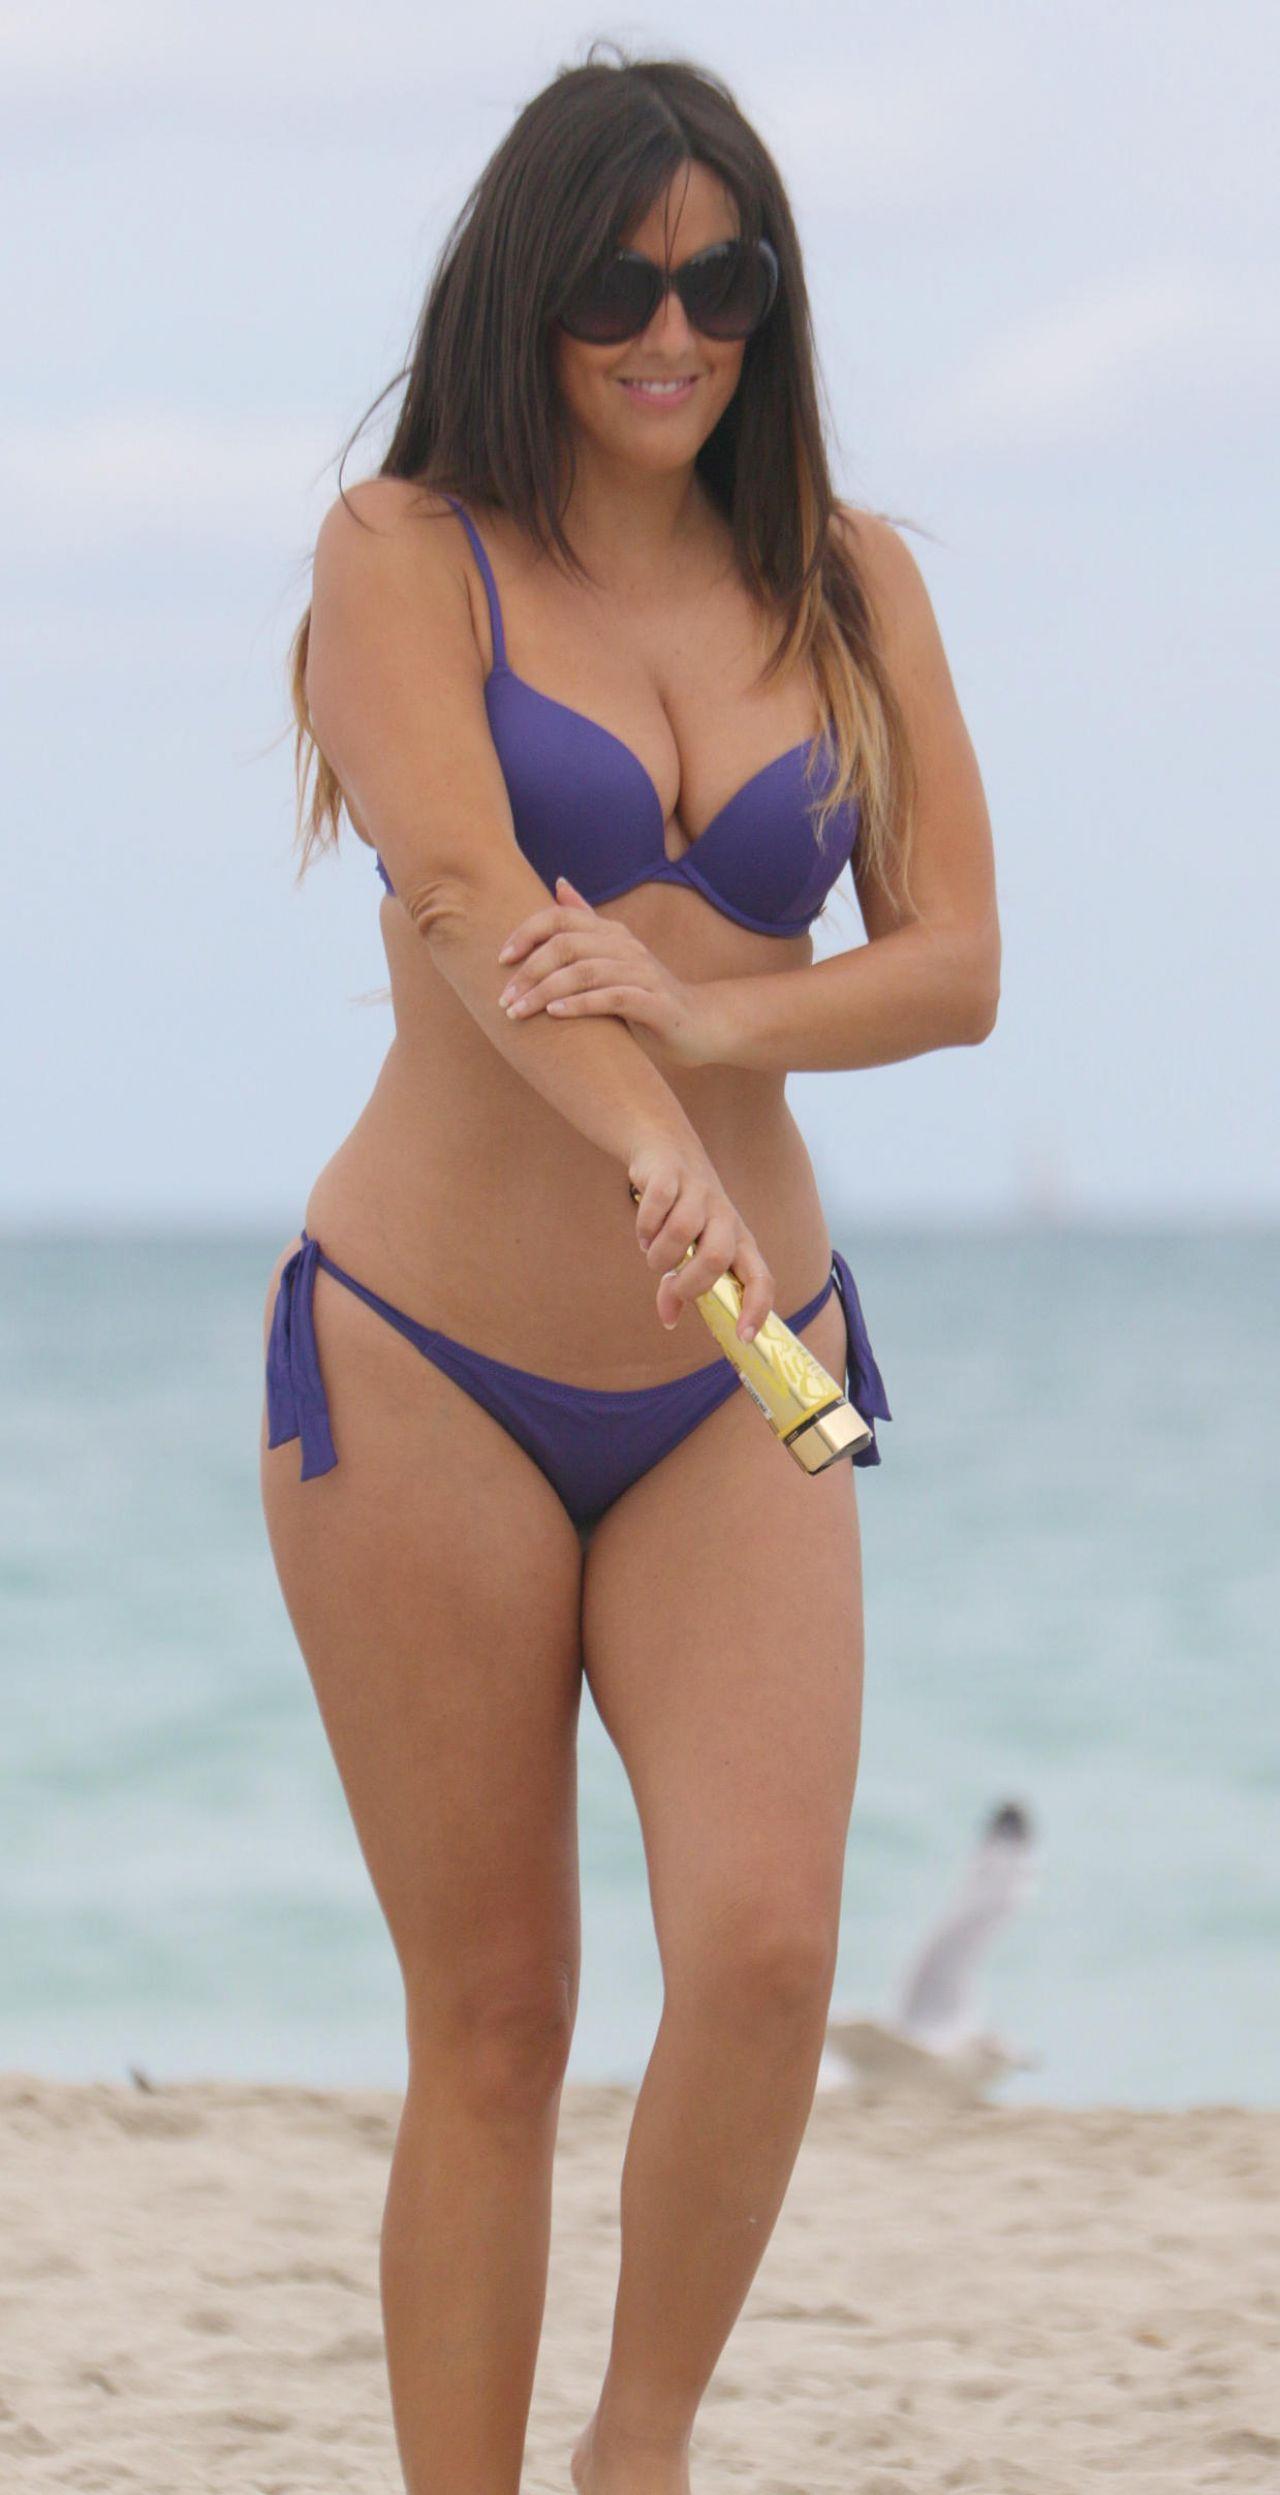 Claudia Romani Hot In A Bikini In Miami 01 13 2016